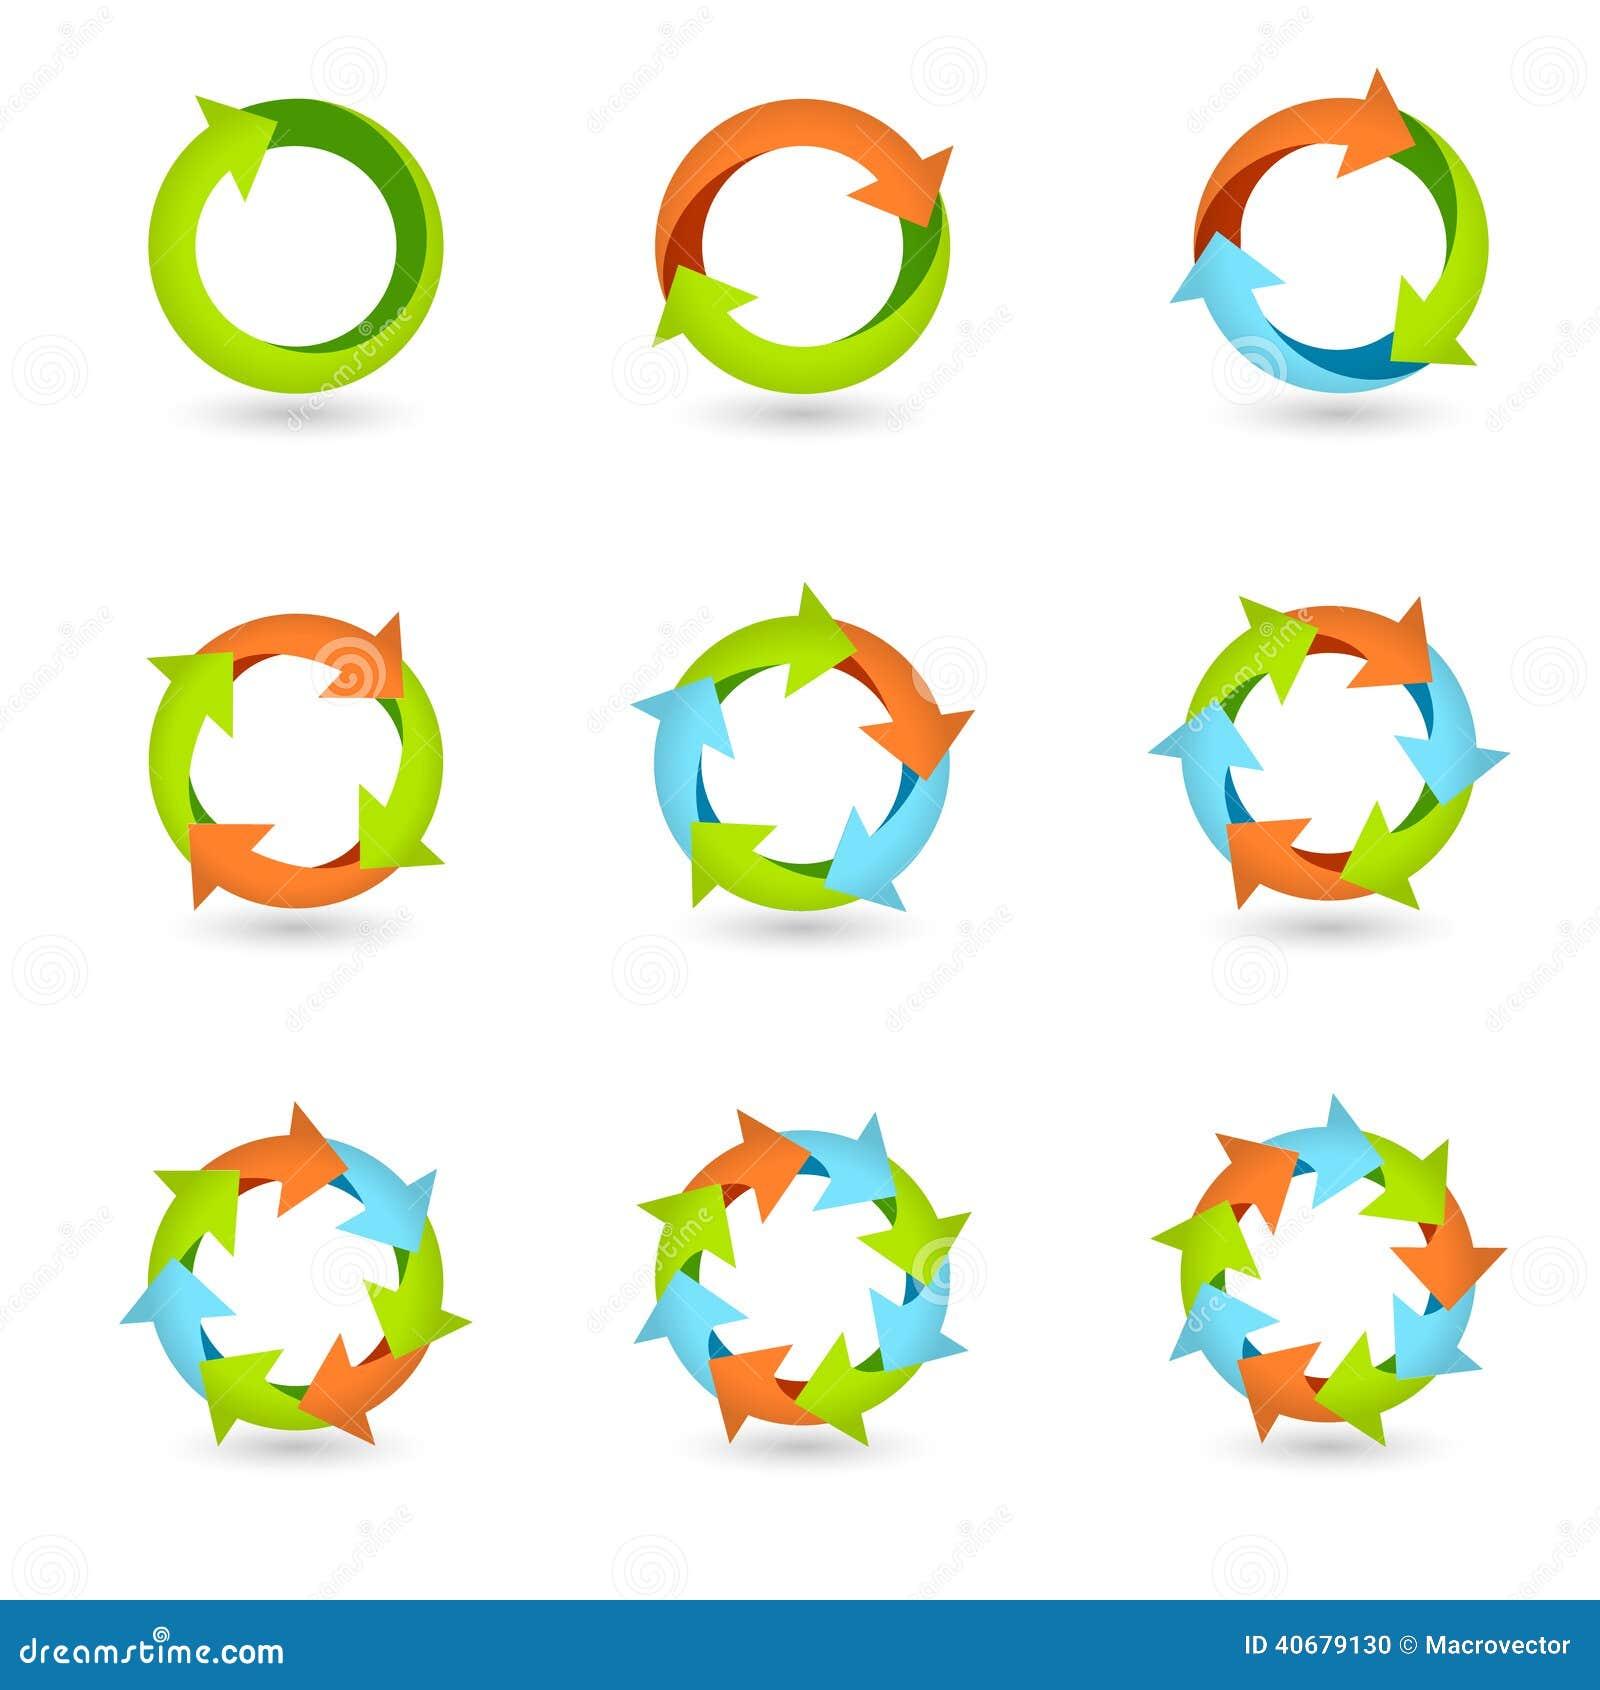 Circle Process Clipart